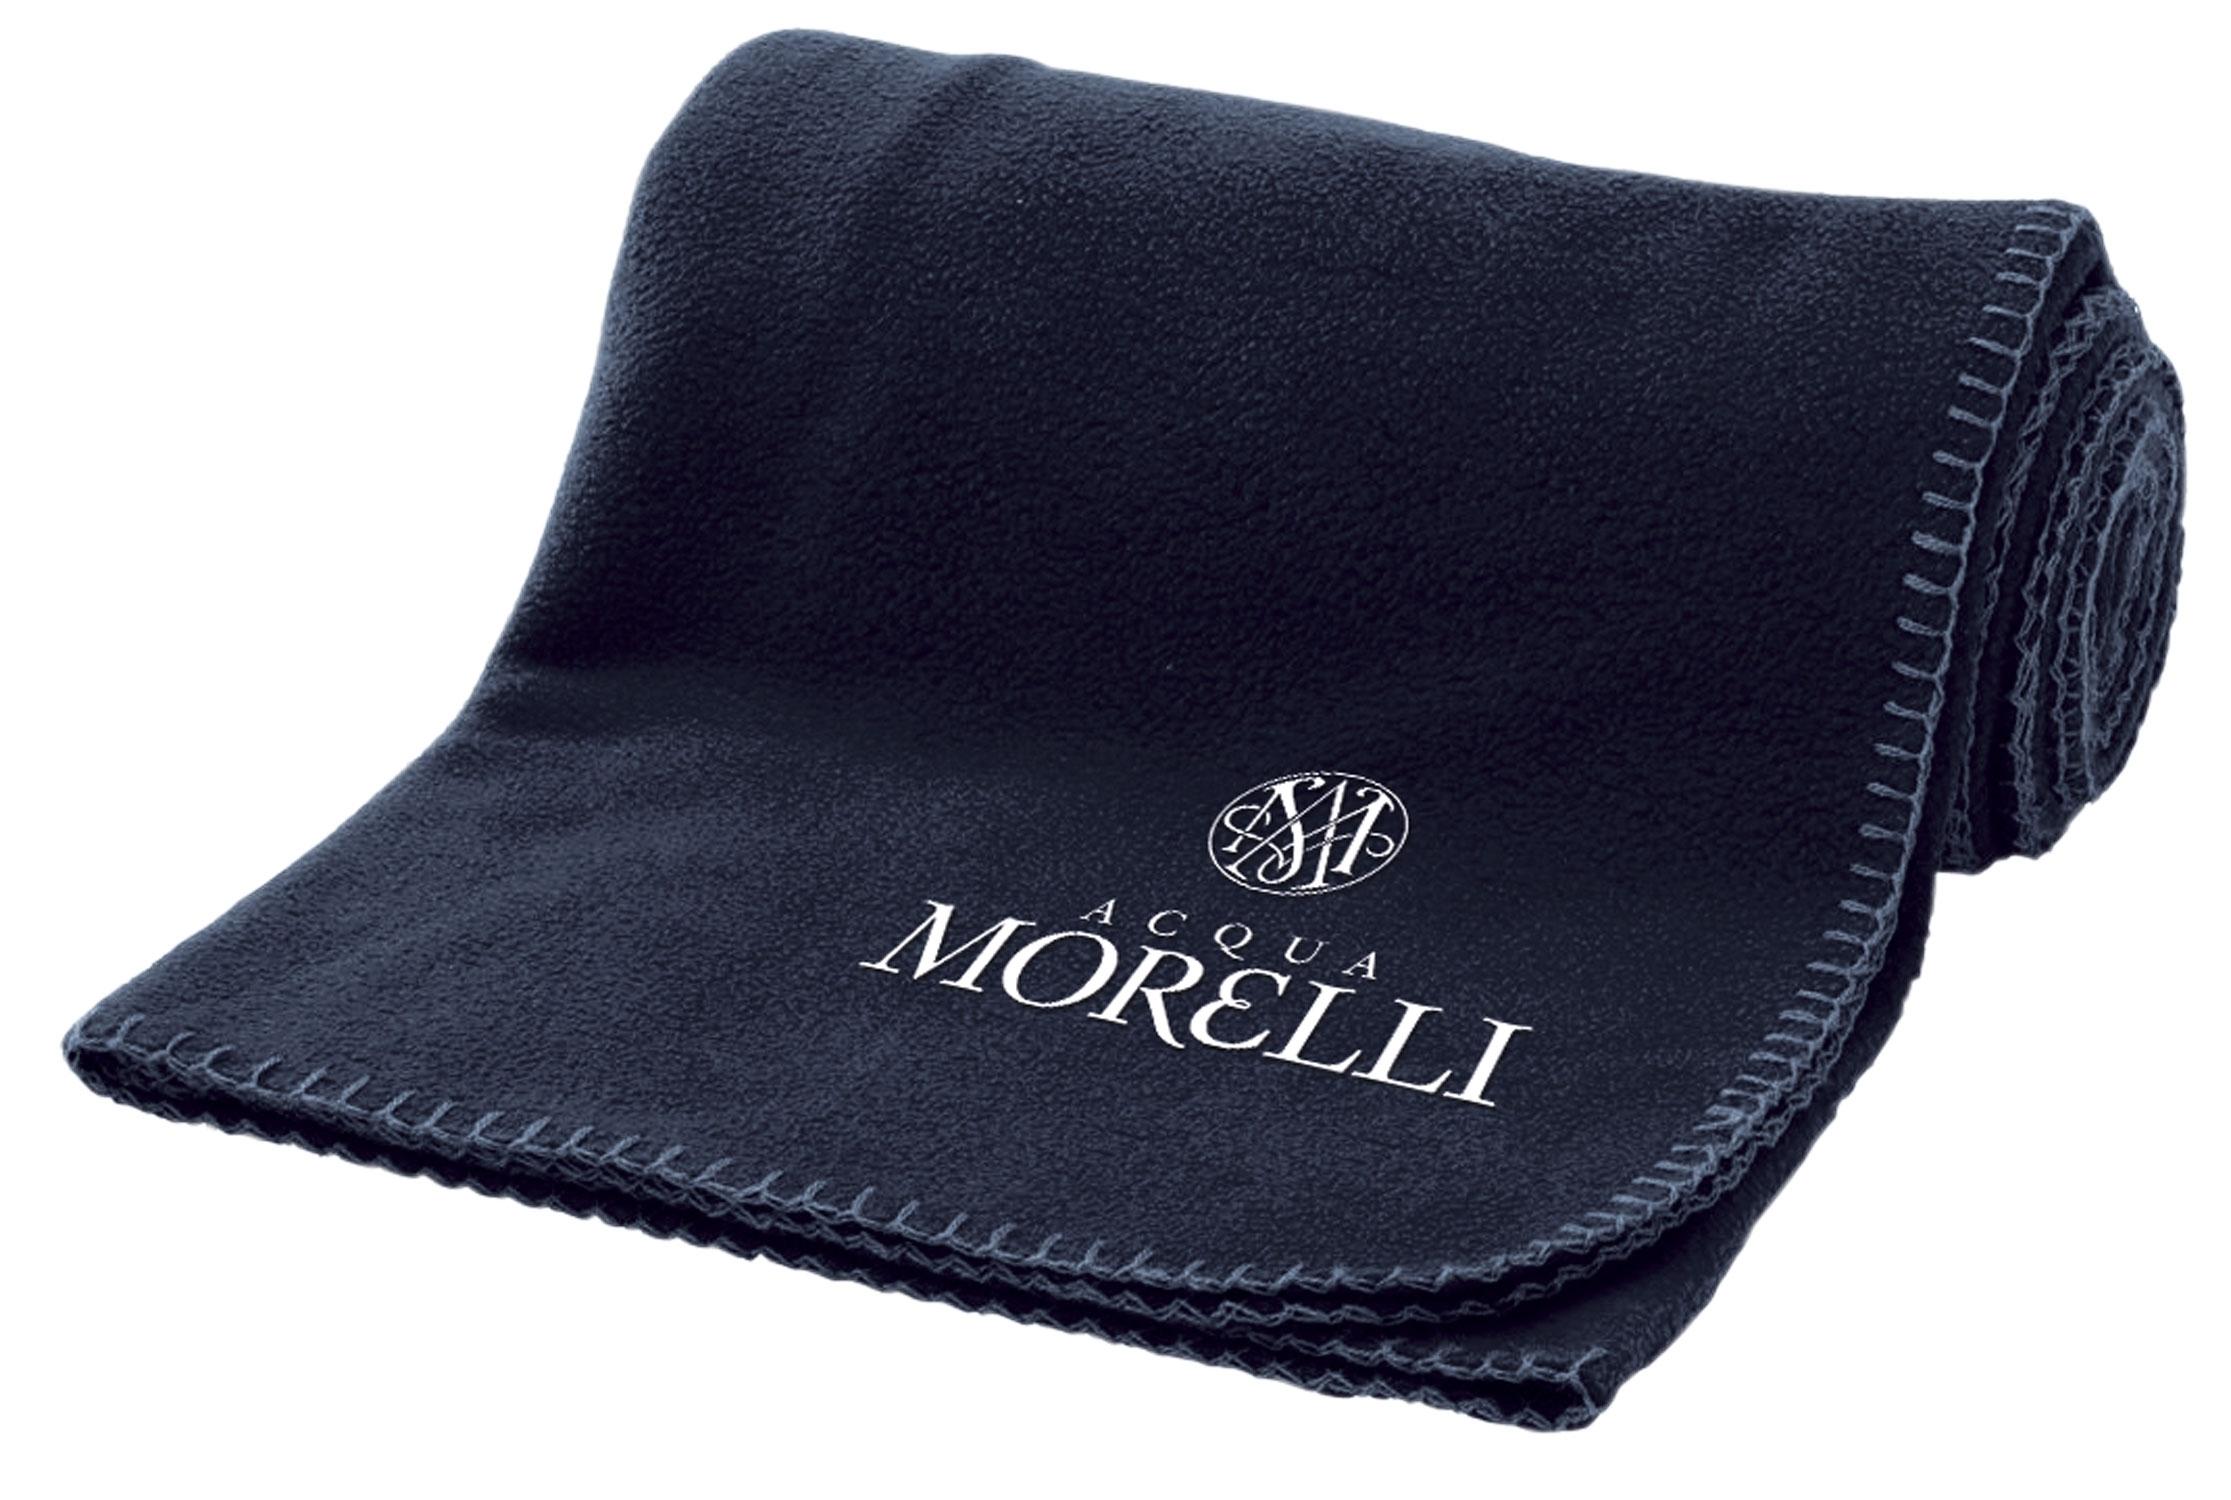 Acqua Morelli Decke Fleecedecke Kuscheldecke 150x130cm